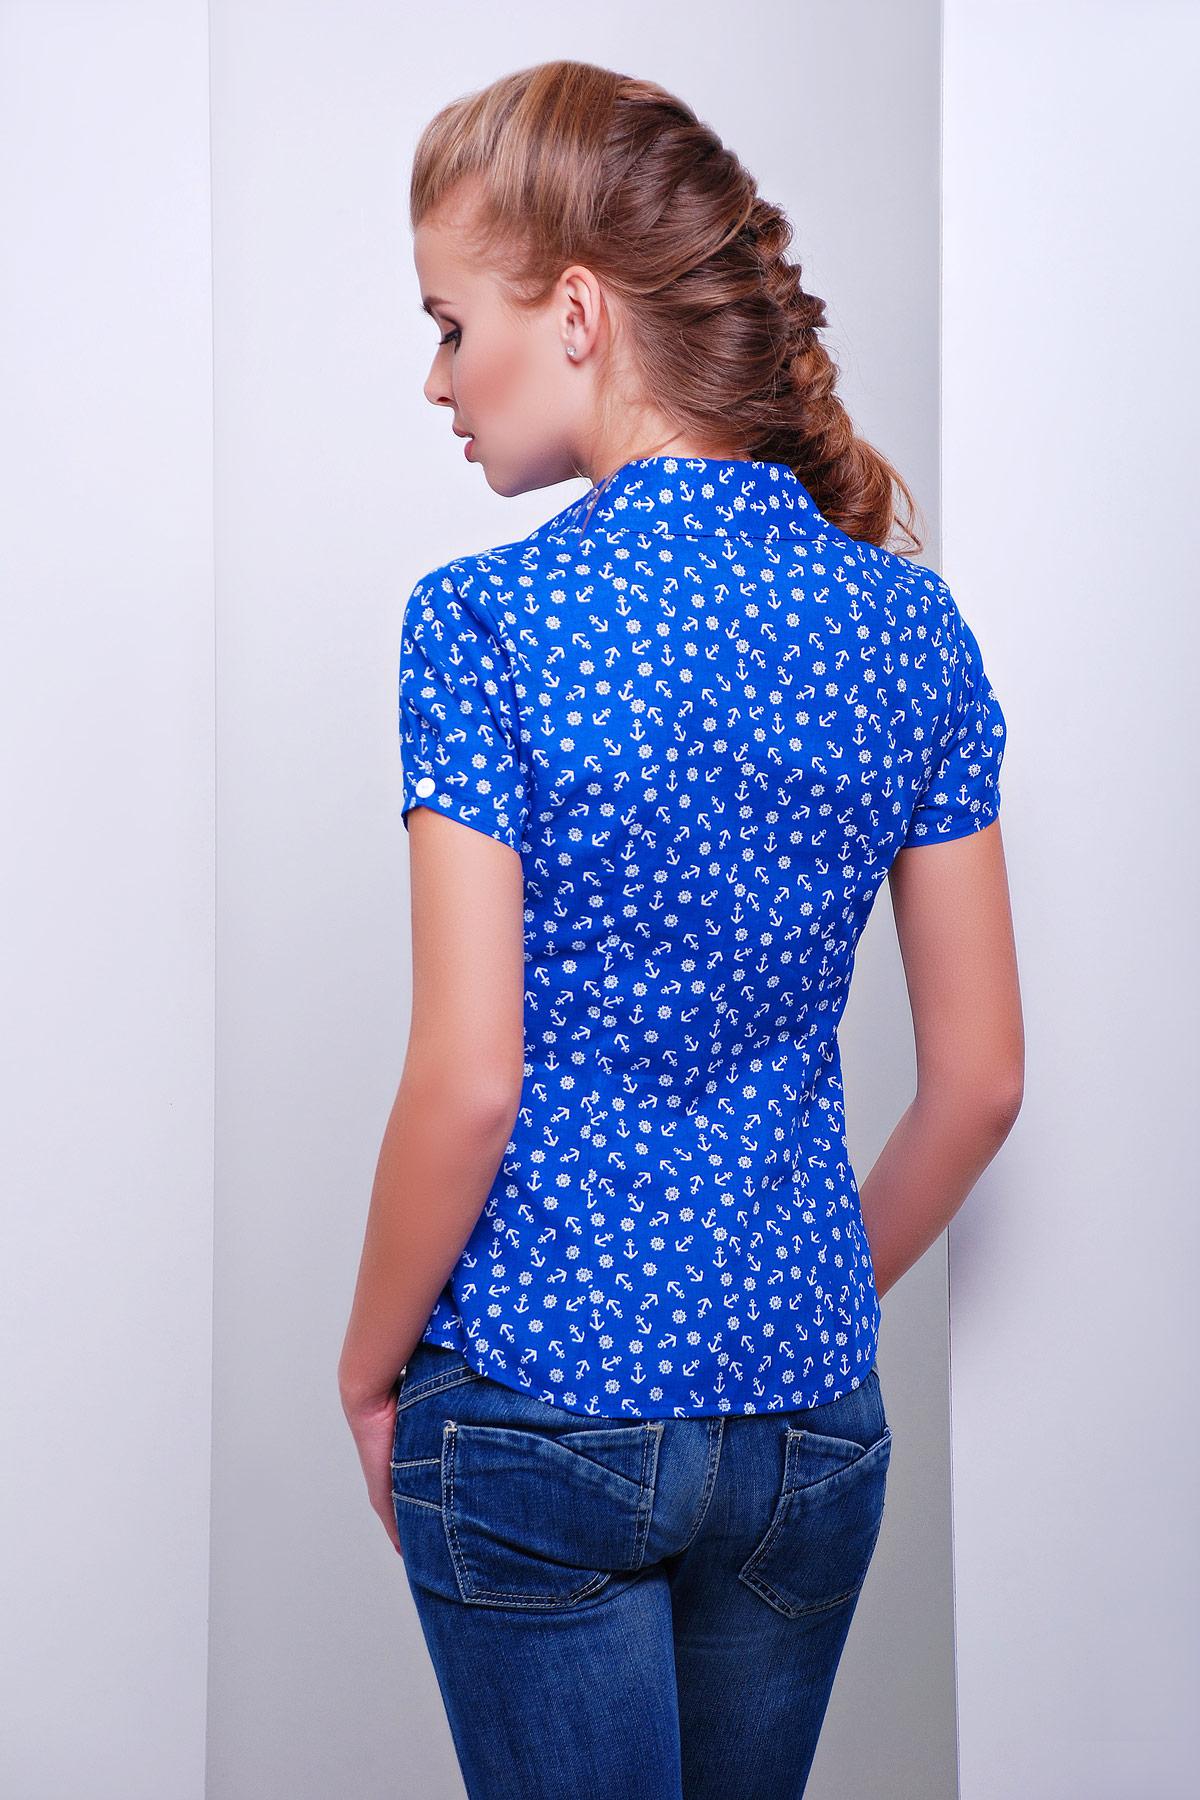 a4abebf19a5 темно-синяя блуза из хлопка с морским принтом и коротким рукавом. блуза  Якира к